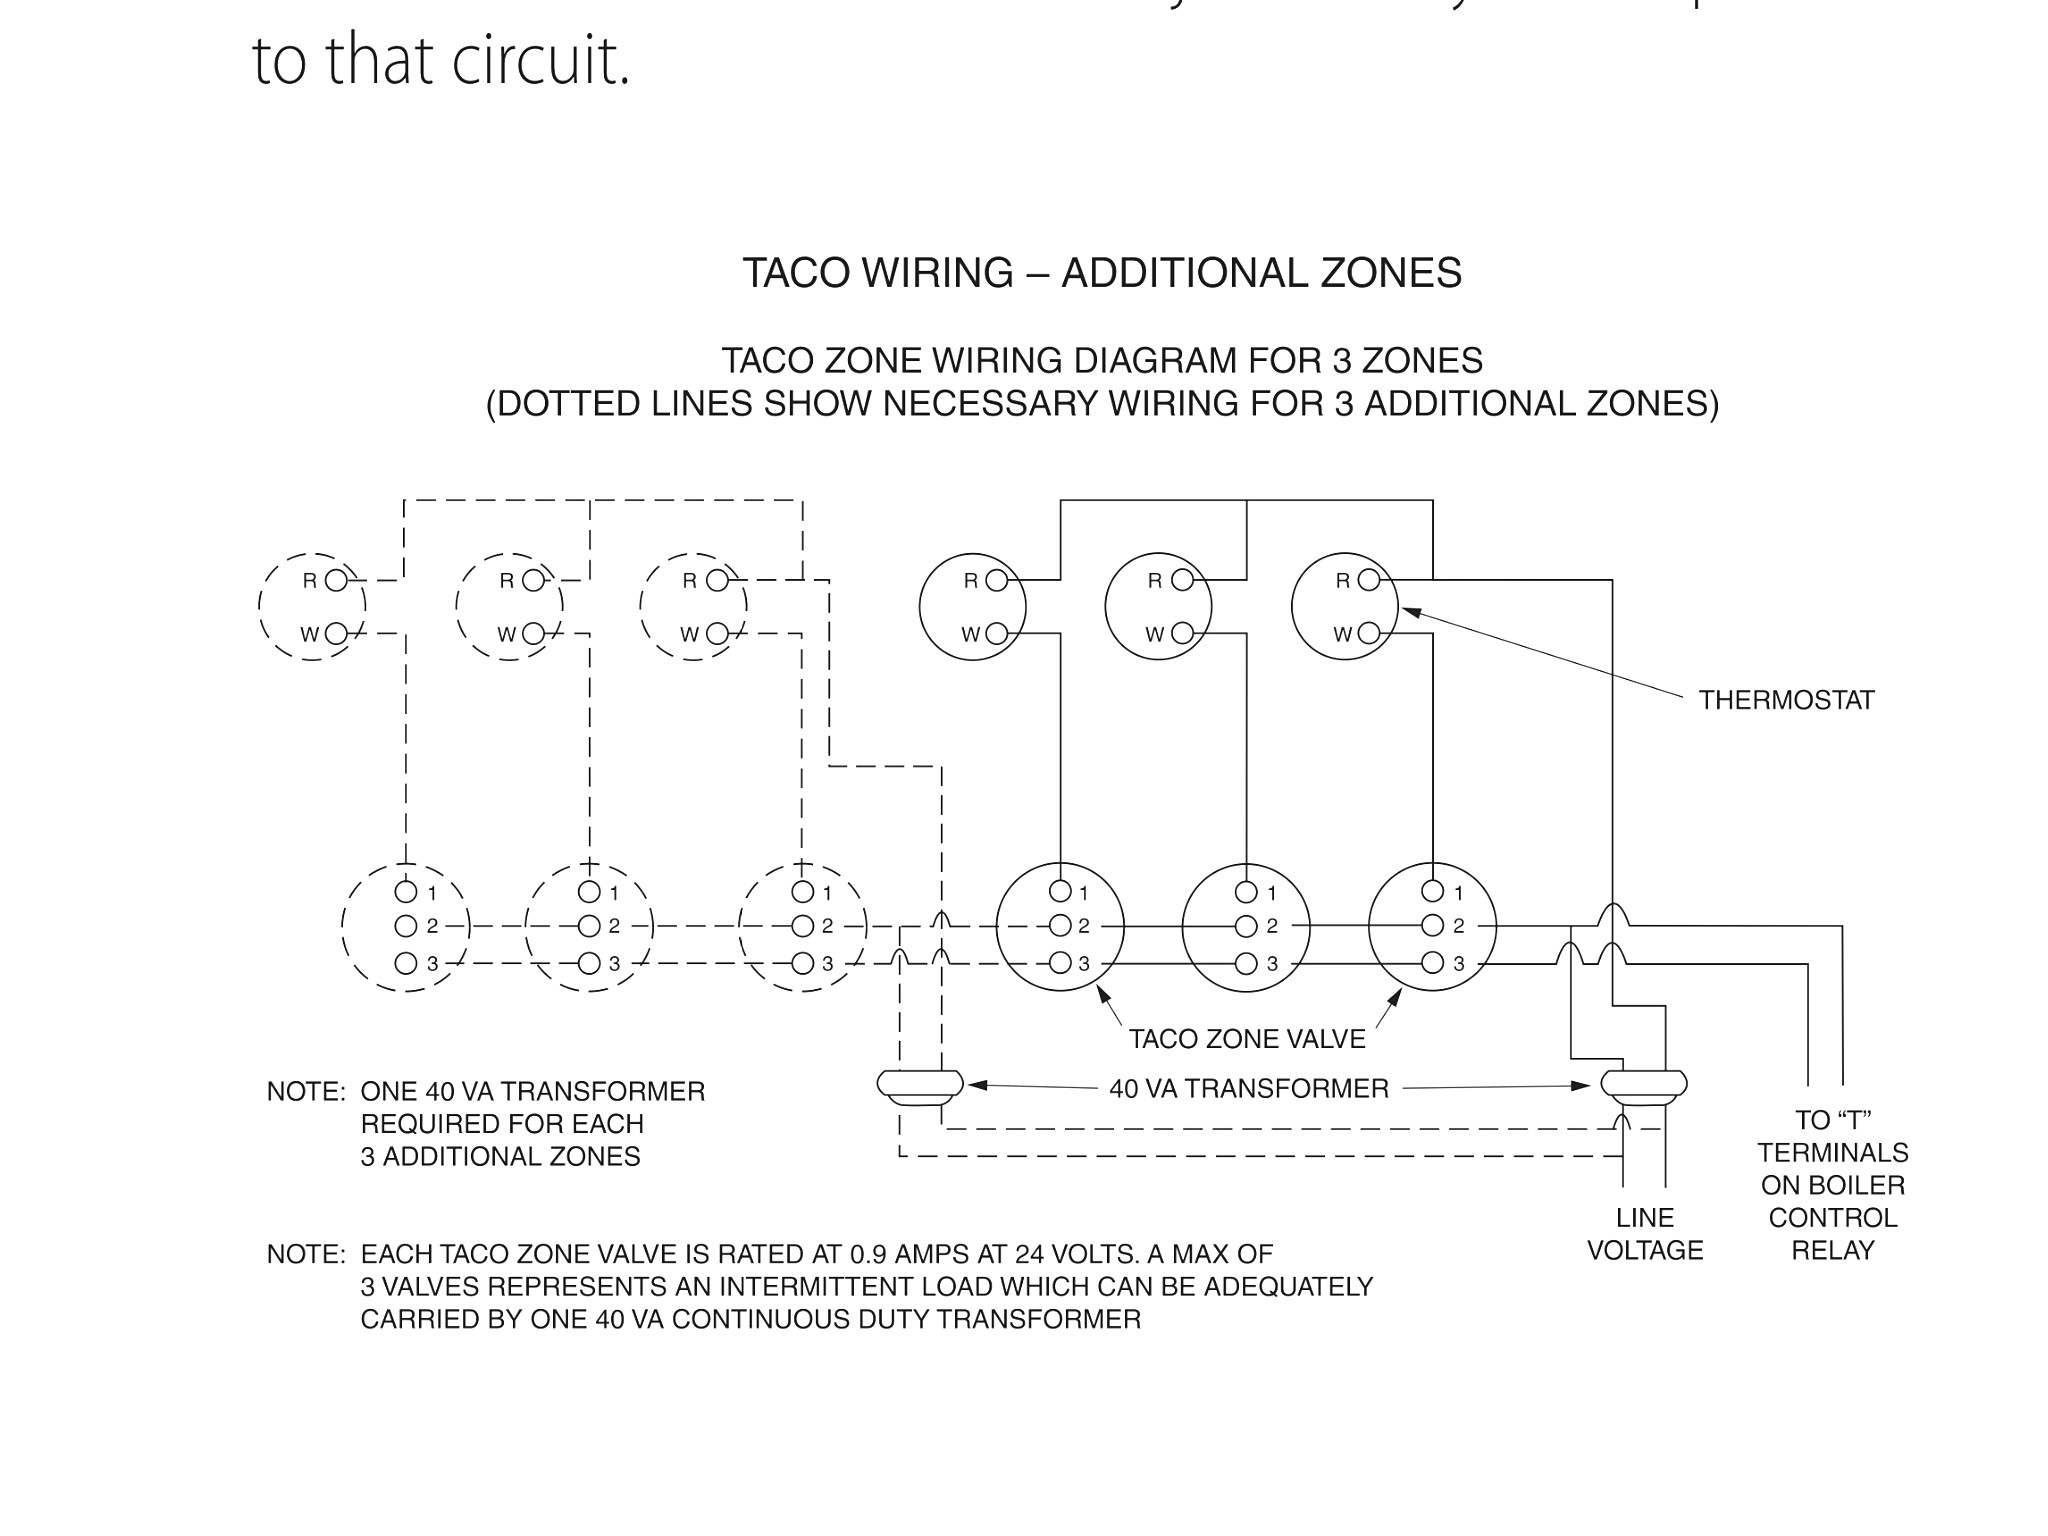 Taco Zone Valve Wiring Diagram Circulating Pump Wiring Throughout Taco Zone Valve Diagram for